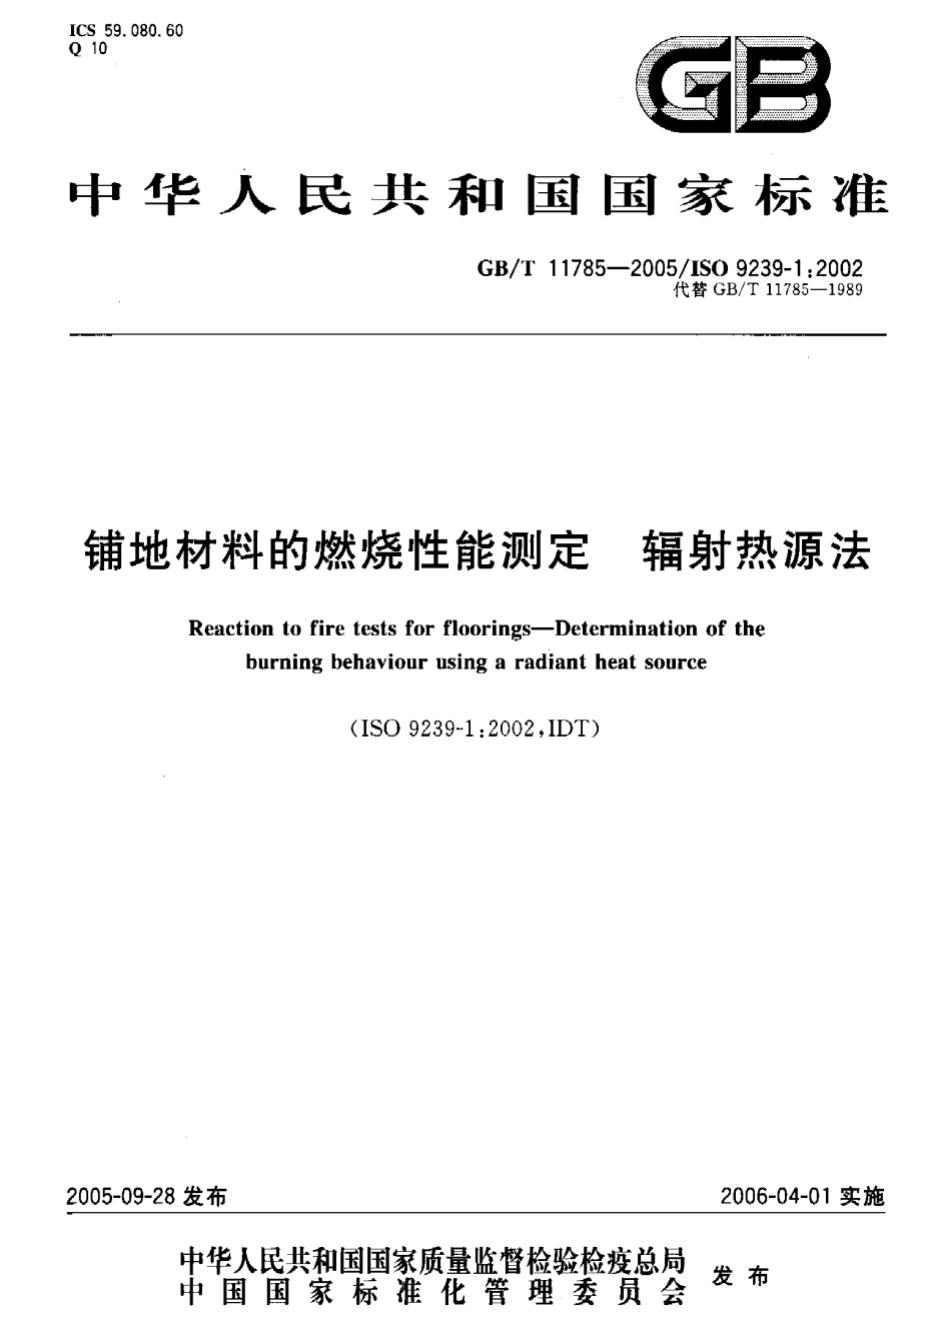 GBT 11785-2005 铺地材料的燃烧性能测定 辐射热源法